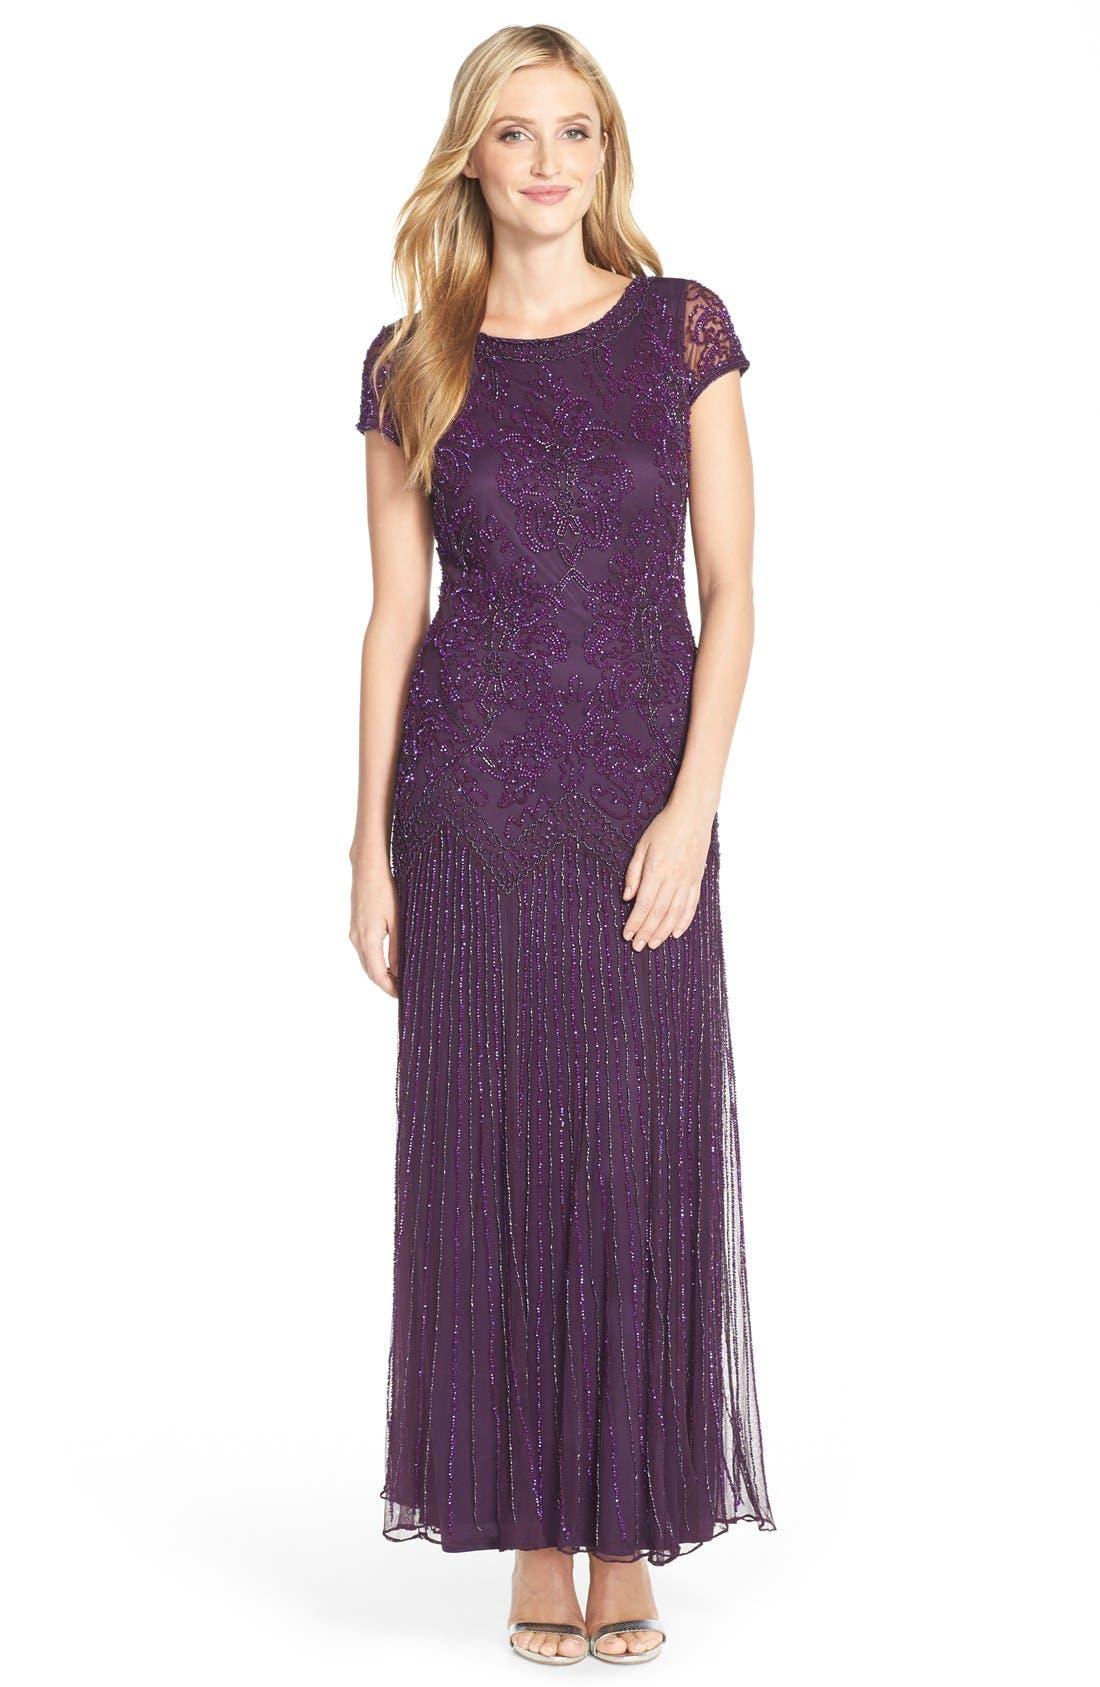 Alternate Image 1 Selected - Pisarro Nights Beaded Mesh A-Line Gown (Regular & Petite)